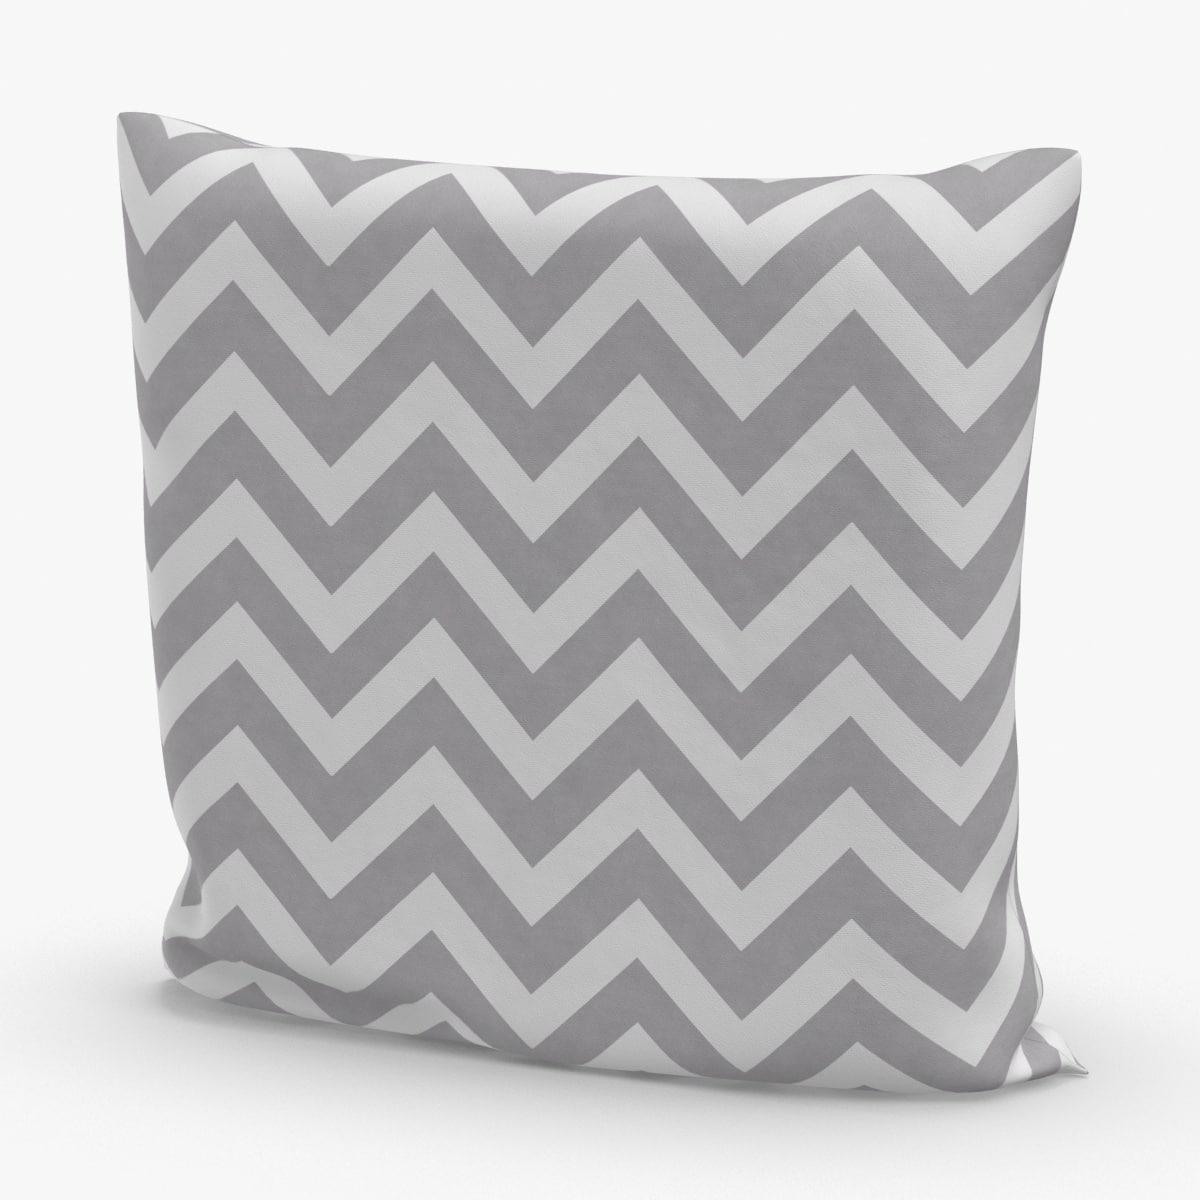 throw-pillow-02---gray-striped 3D